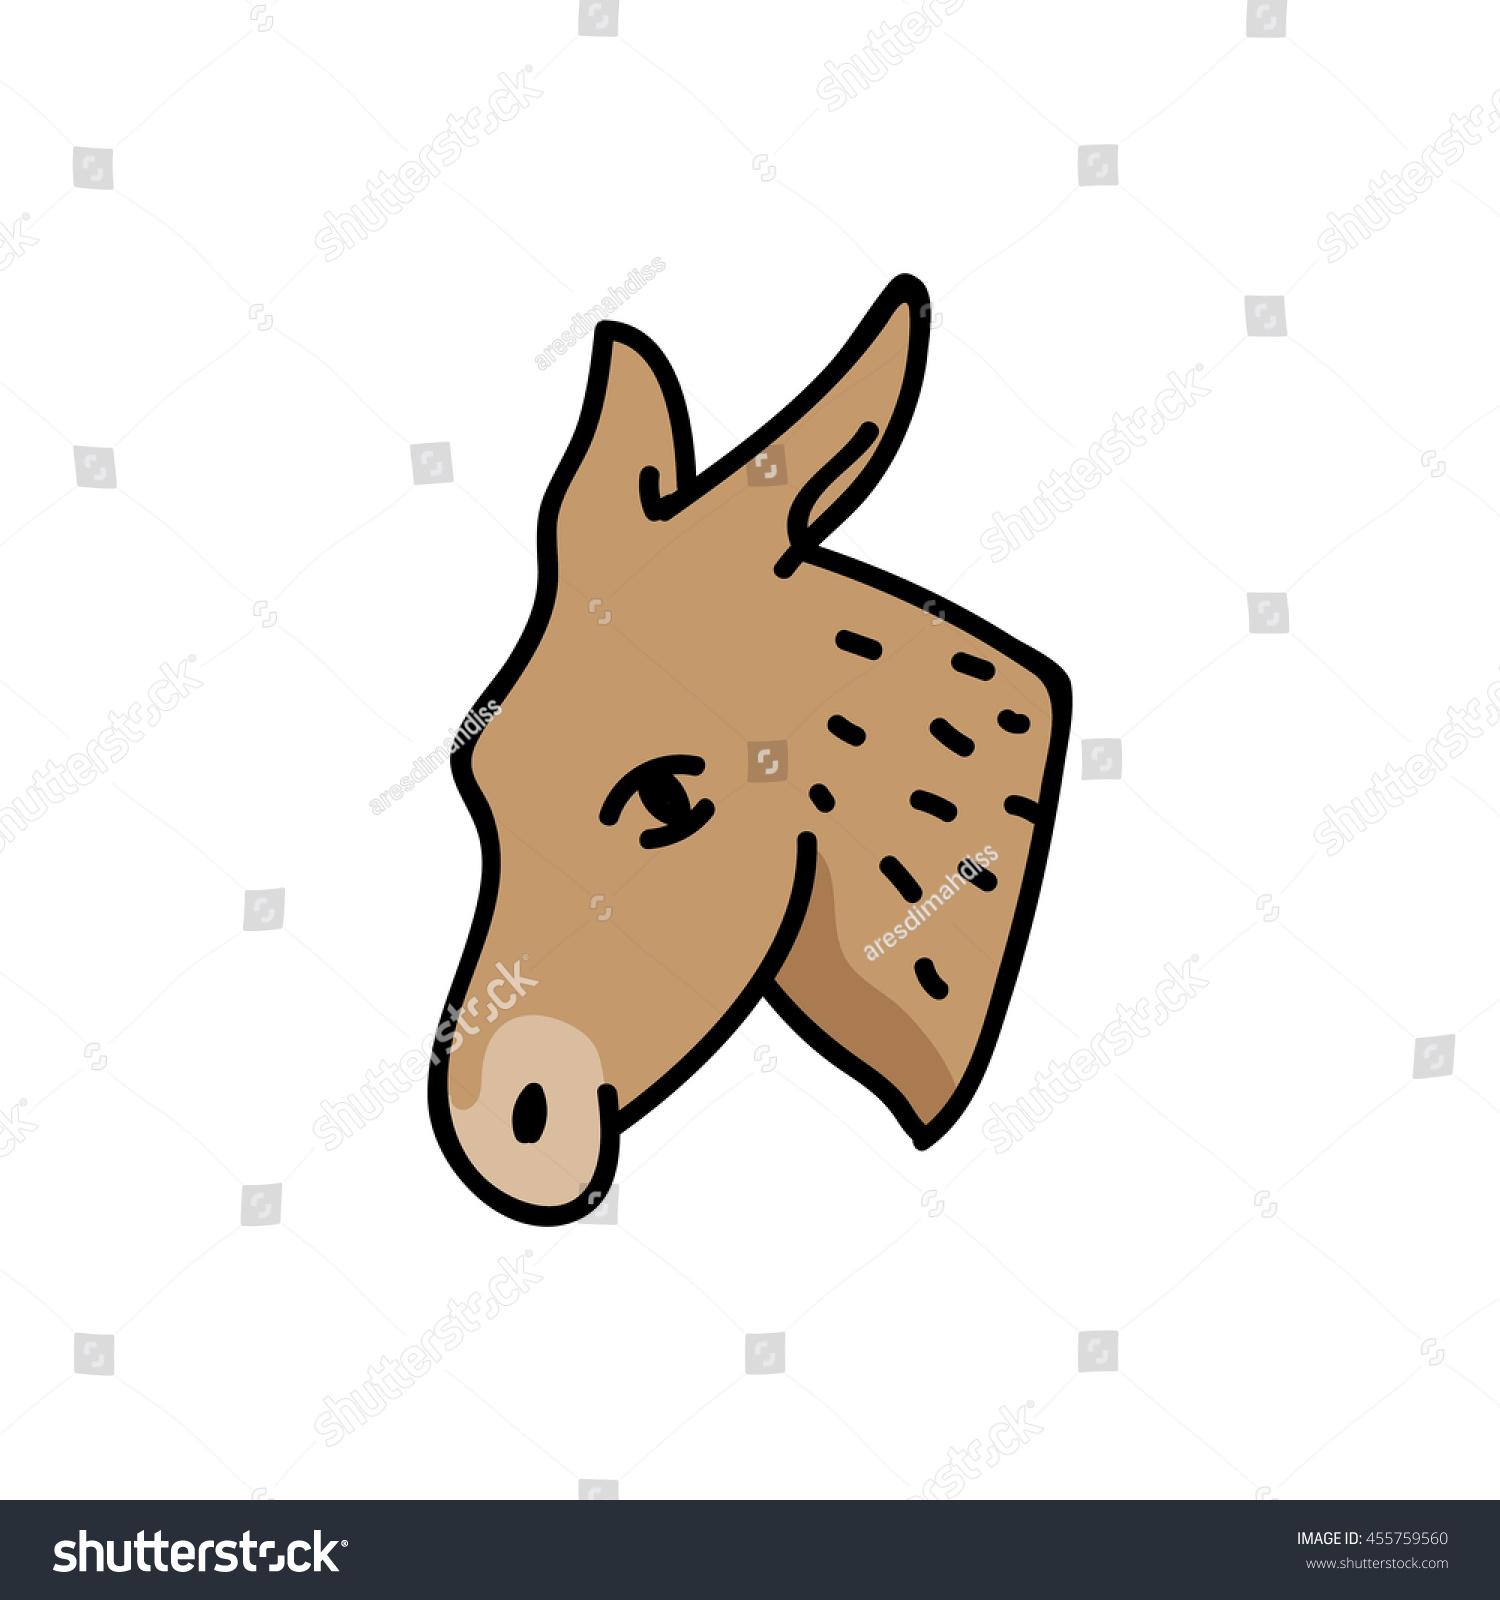 Donkey head mascot democratic party symbol stock vector 455759560 donkey head mascot democratic party symbol usa biocorpaavc Image collections